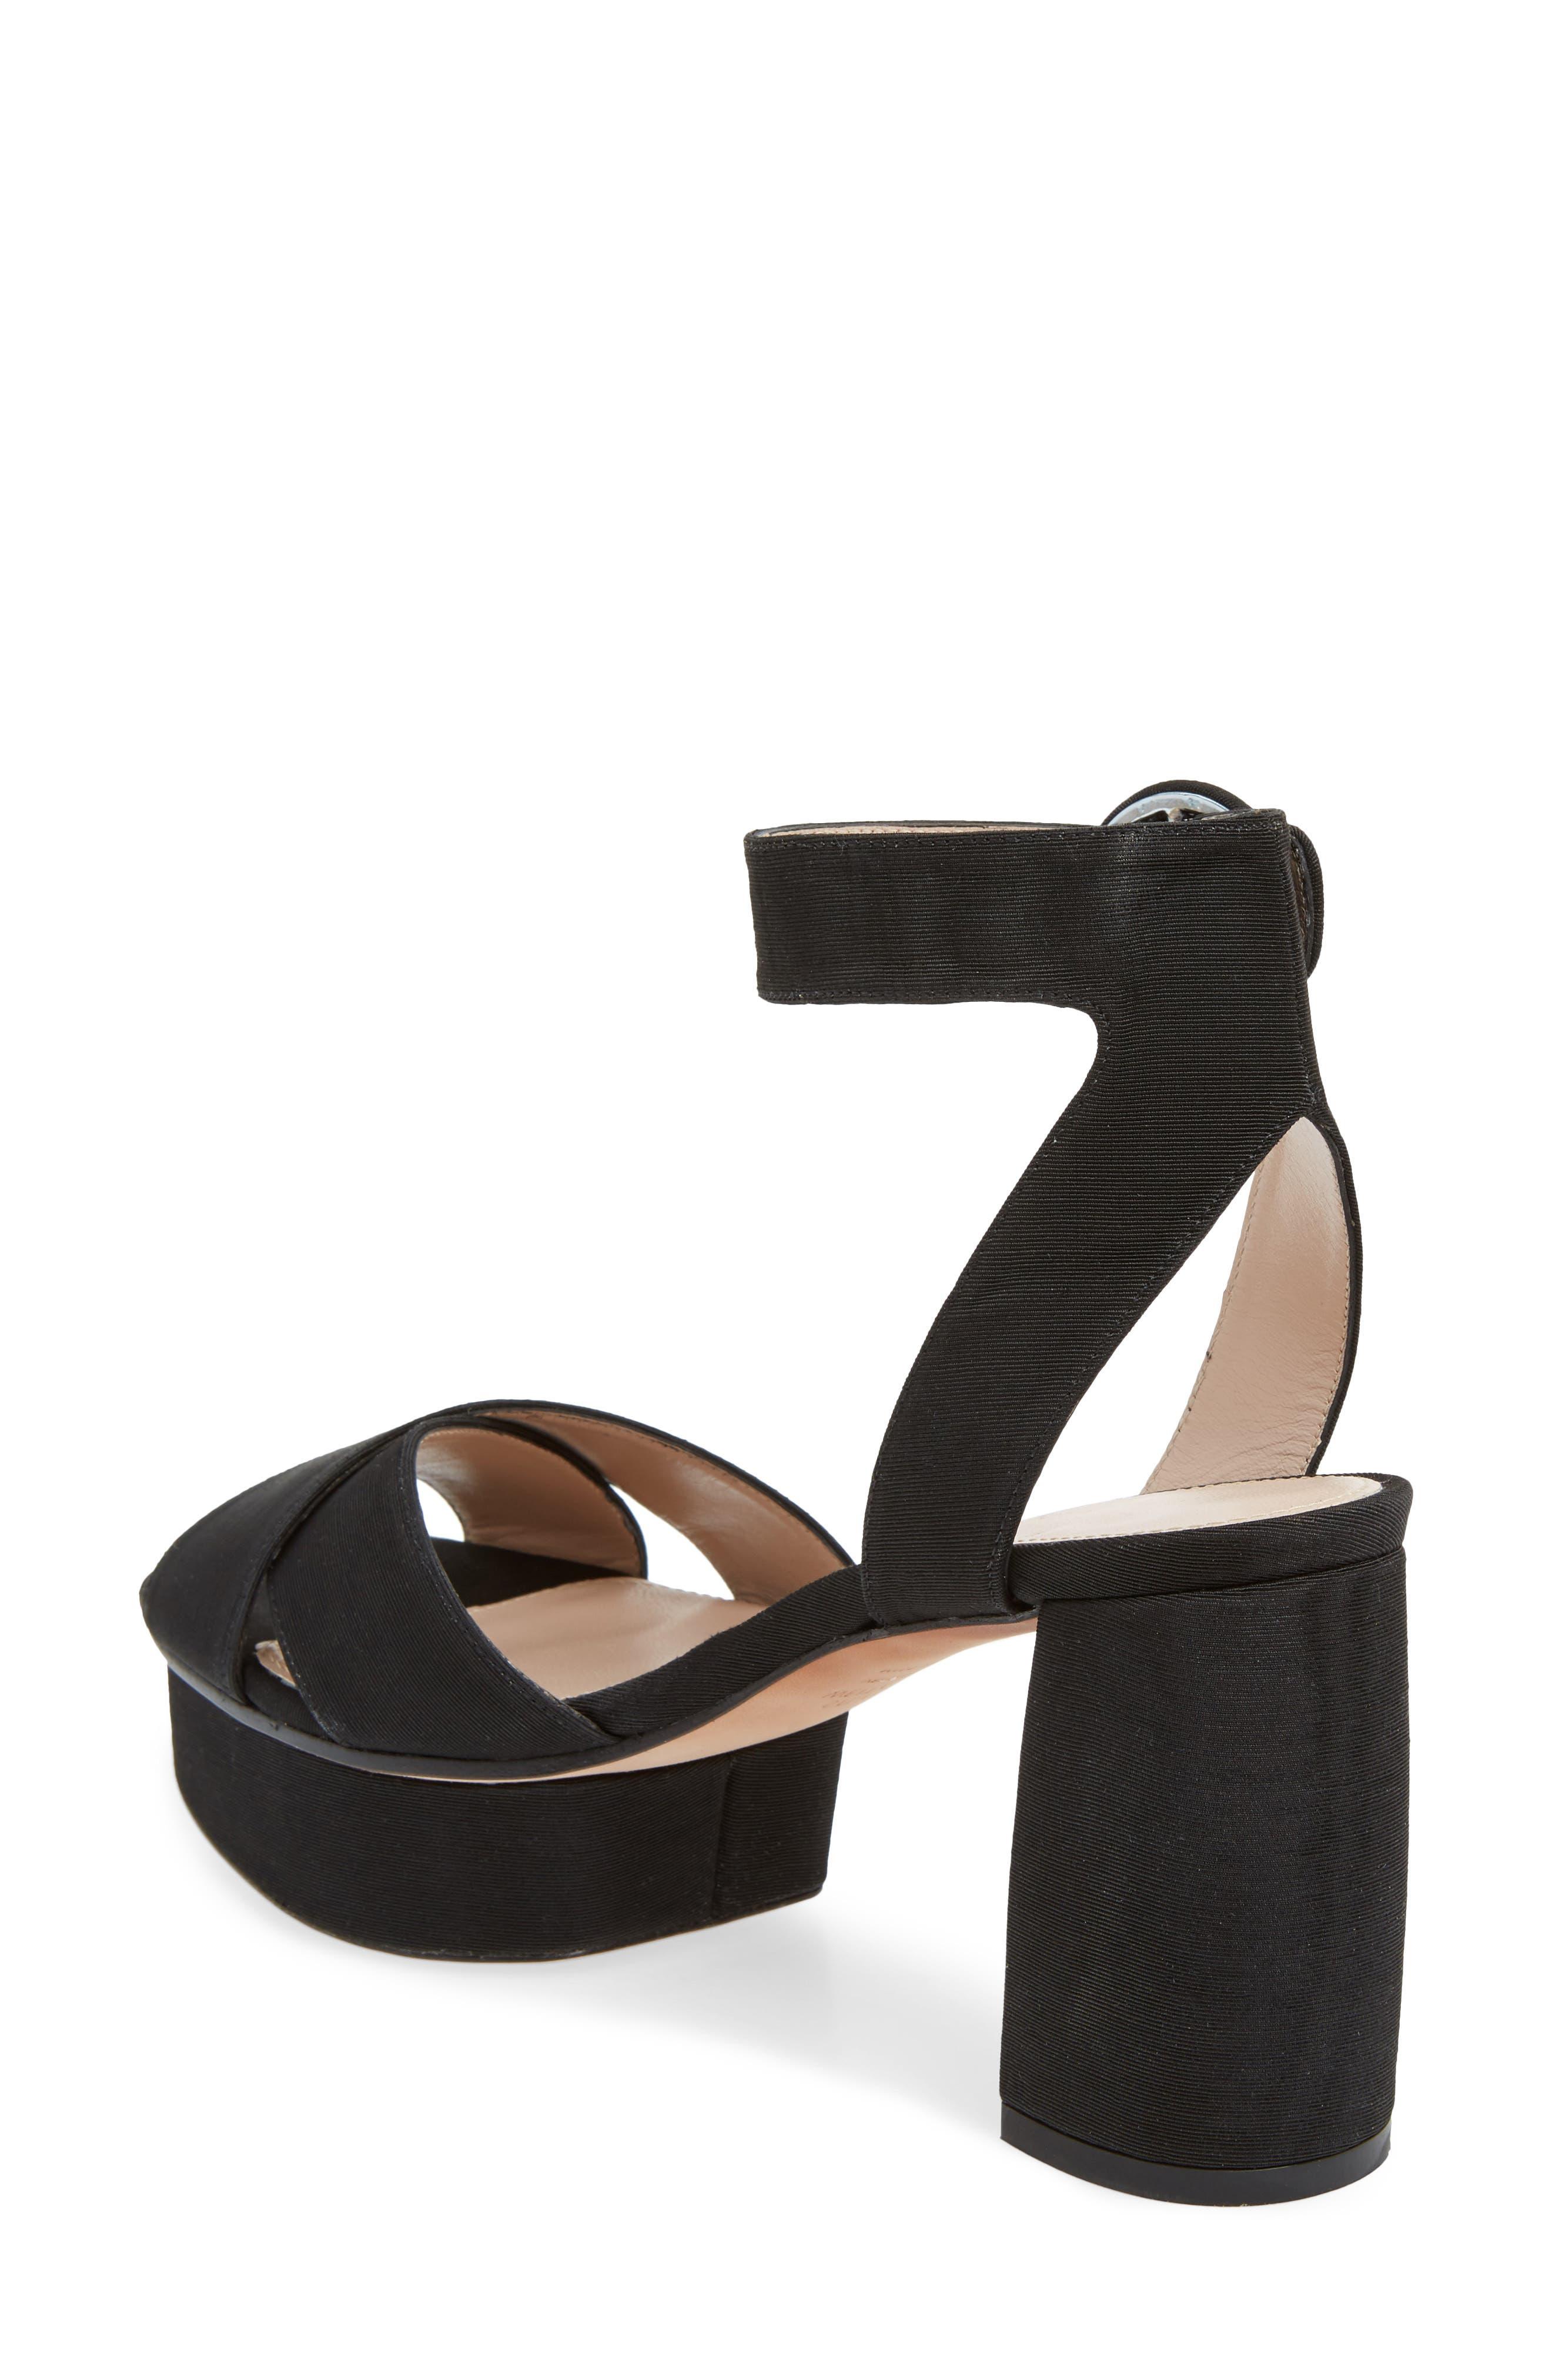 Carmina Ankle Strap Platform Sandal,                             Alternate thumbnail 2, color,                             001